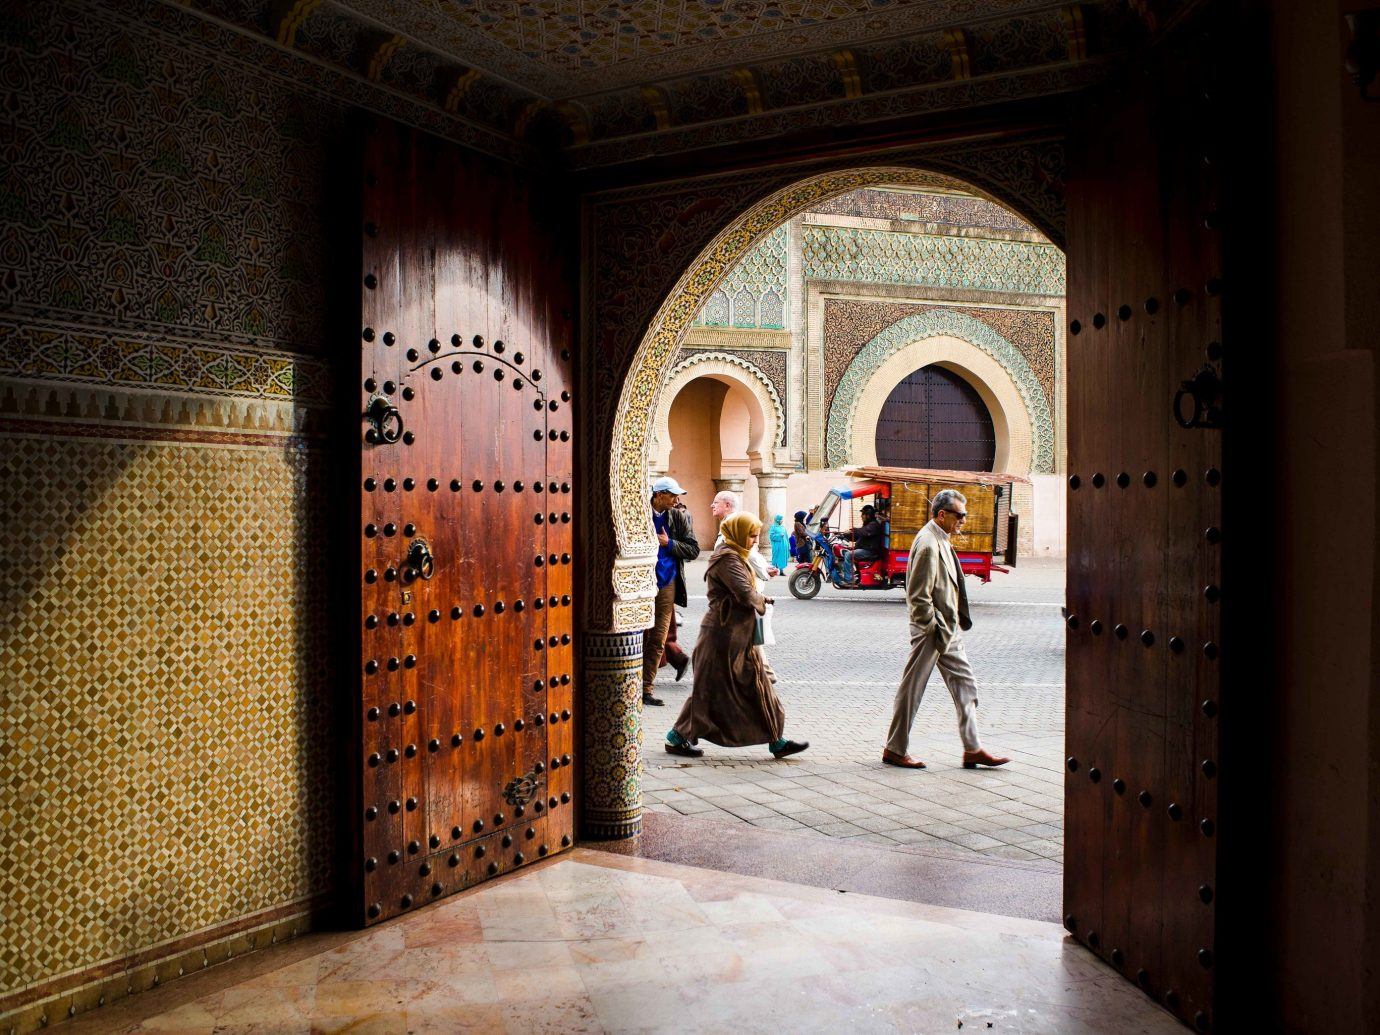 Arts + Culture Marrakech Morocco Style + Design outdoor arch temple tourist attraction window colonnade